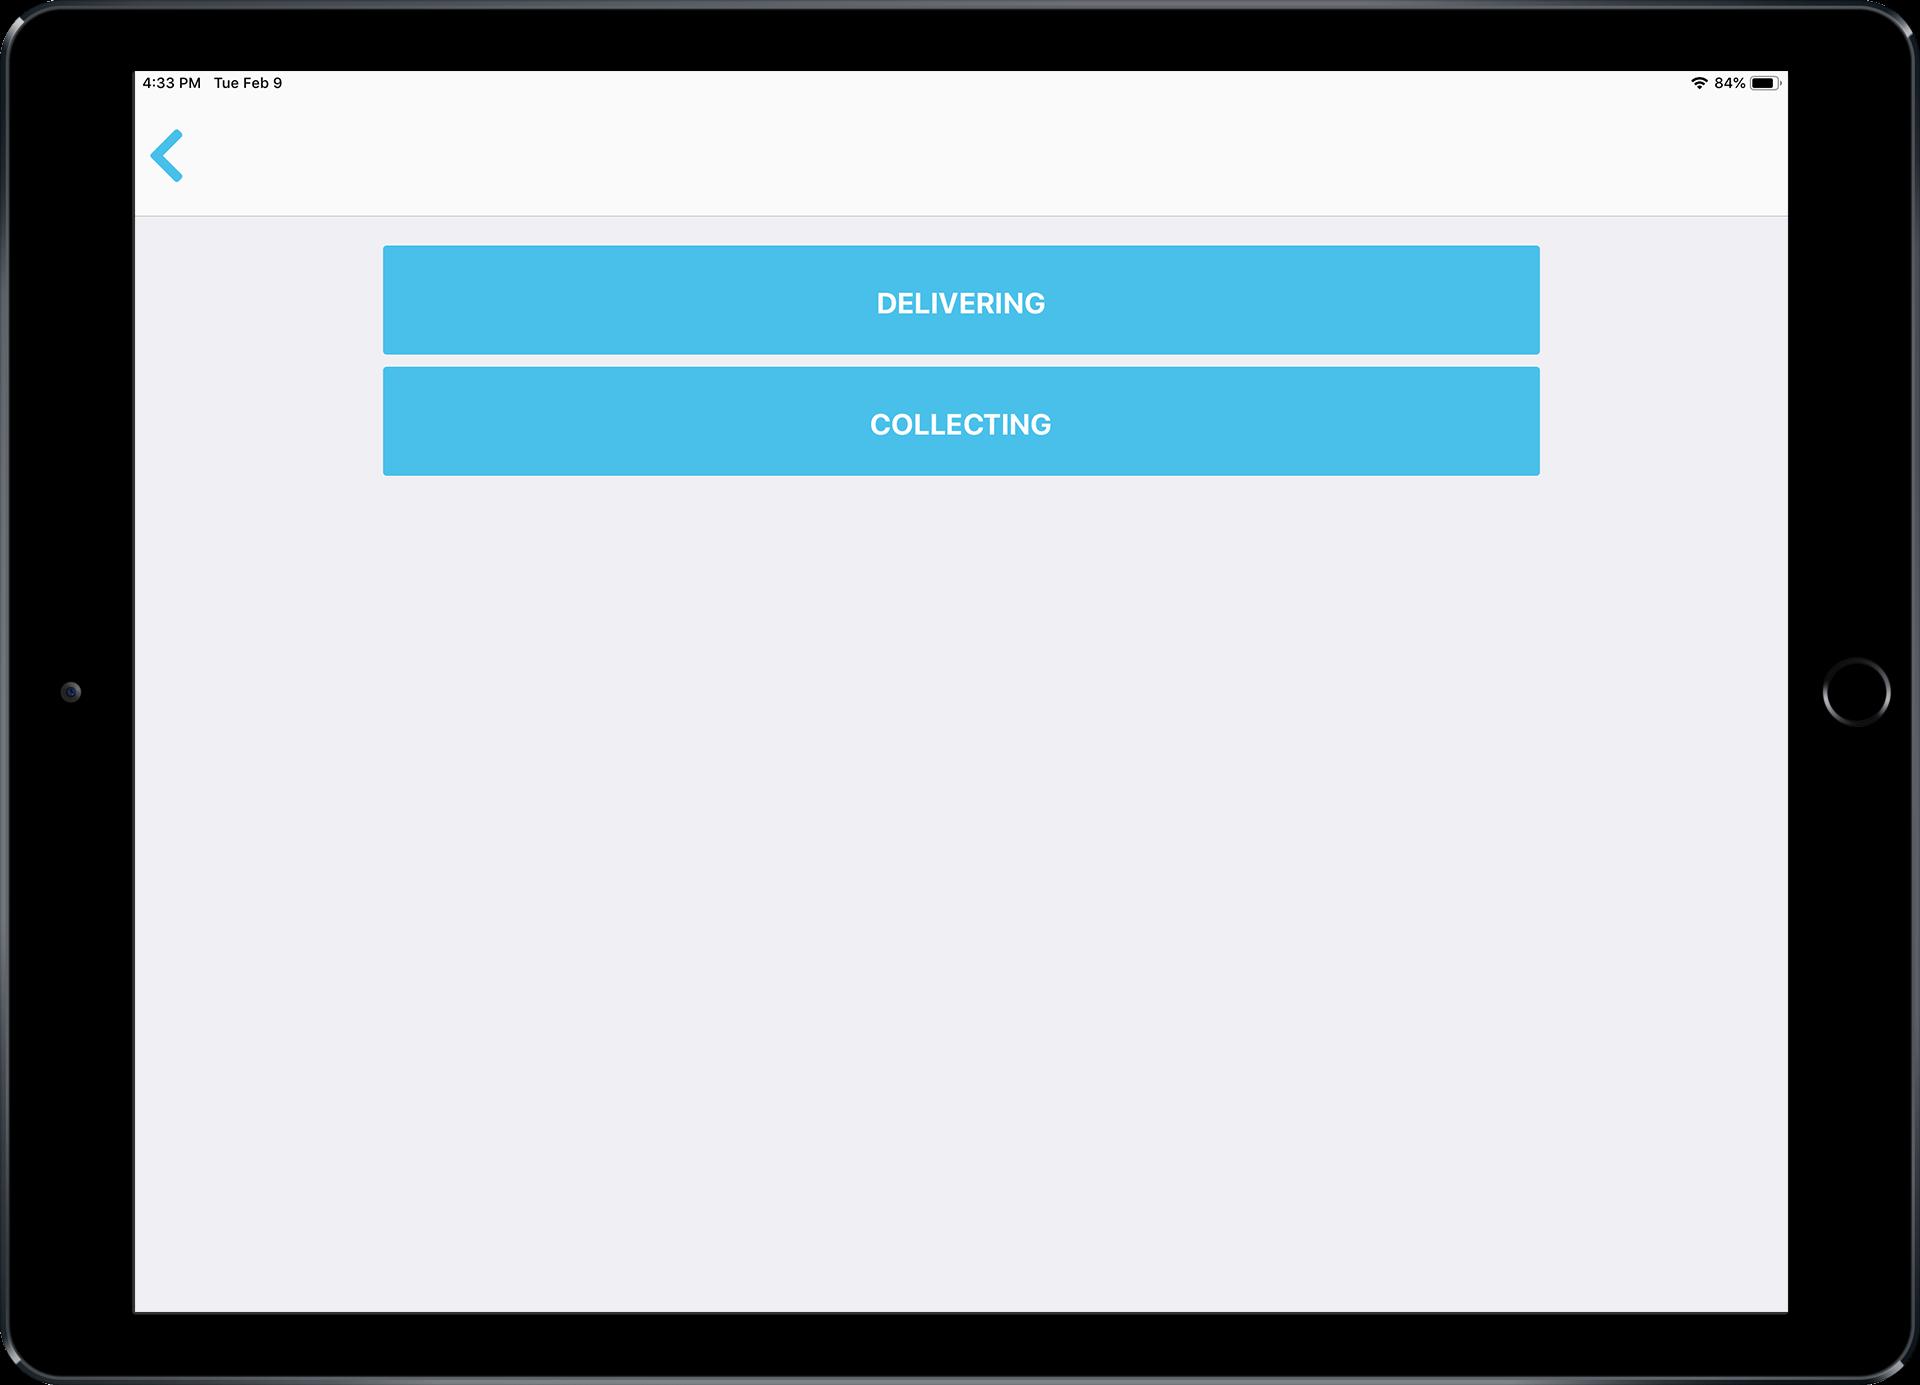 Deliveries iPad